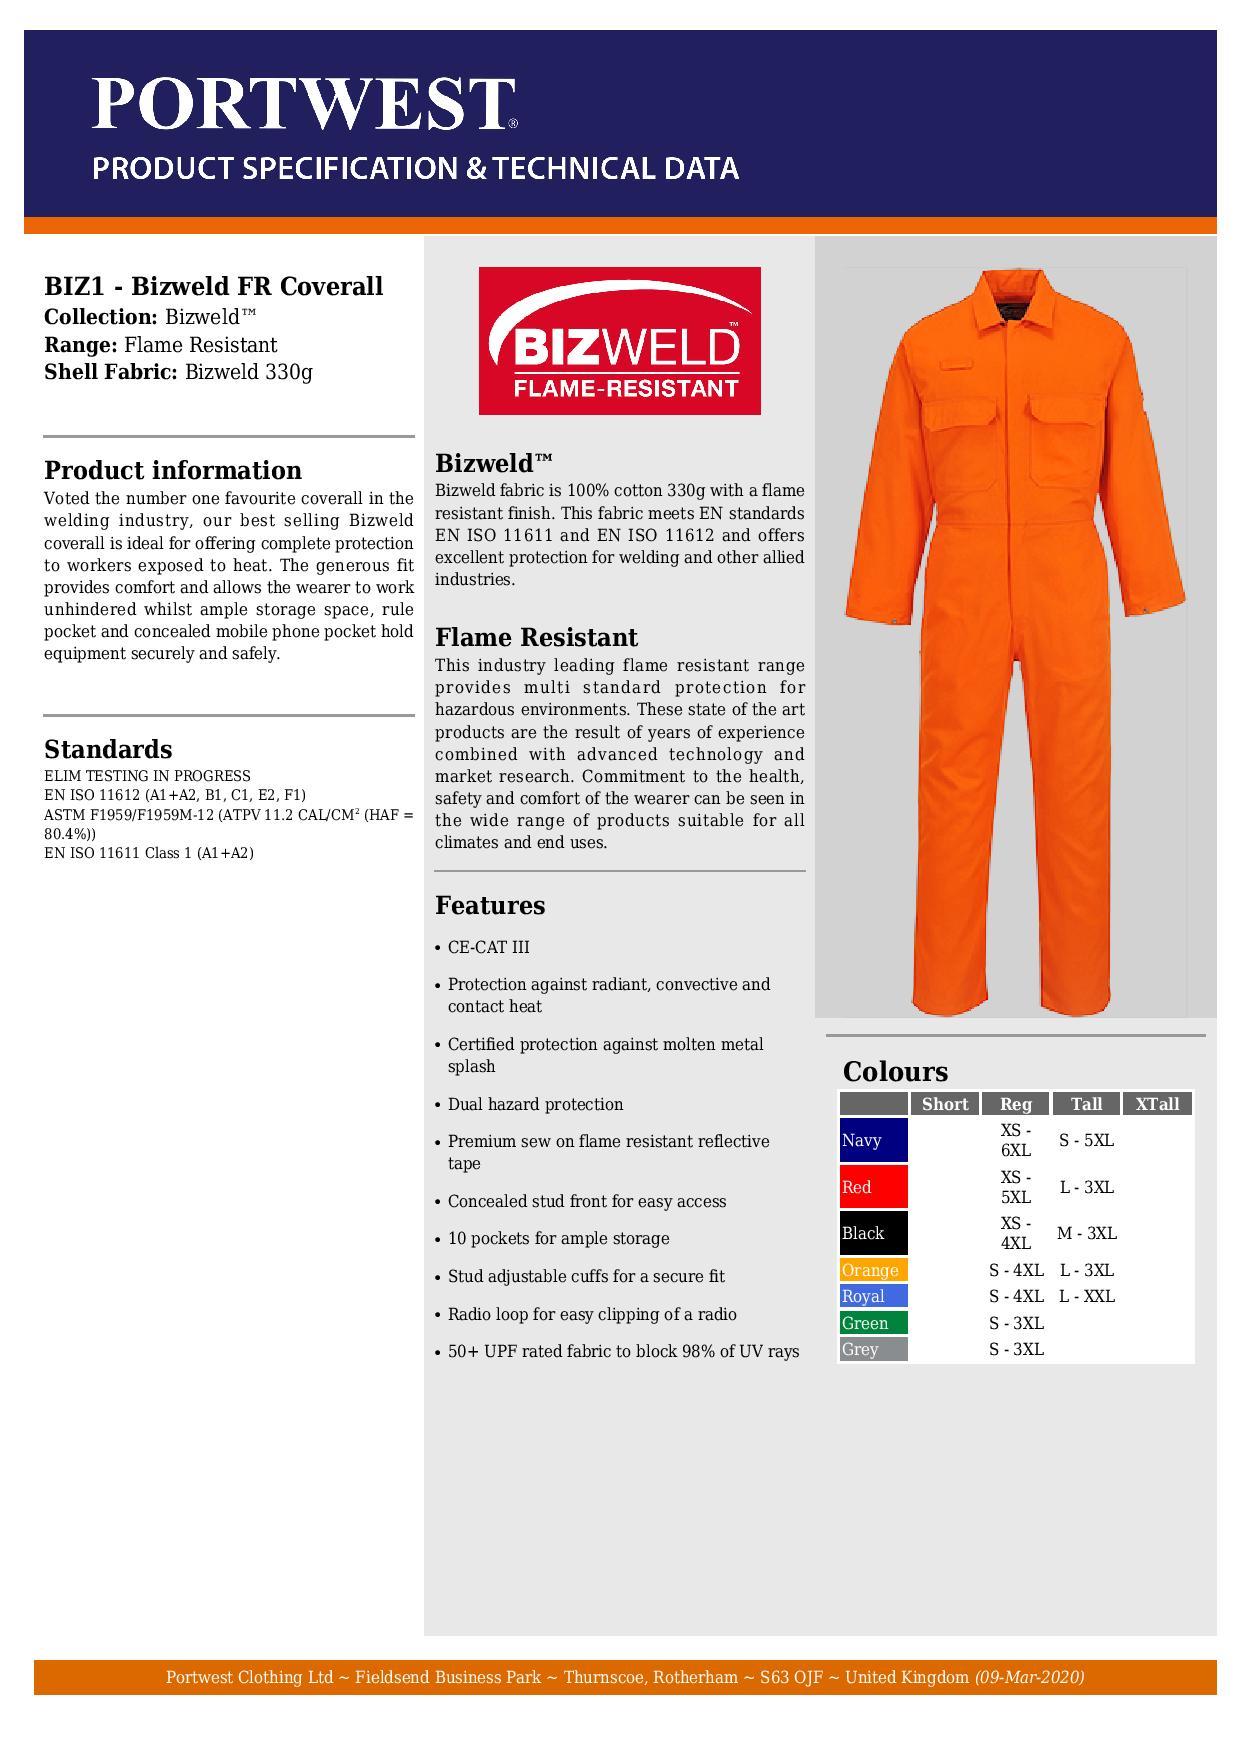 Portwest BIZ1ORRXXL Bizweld Flame Resistant Coverall Regular Size: XX-Large Orange